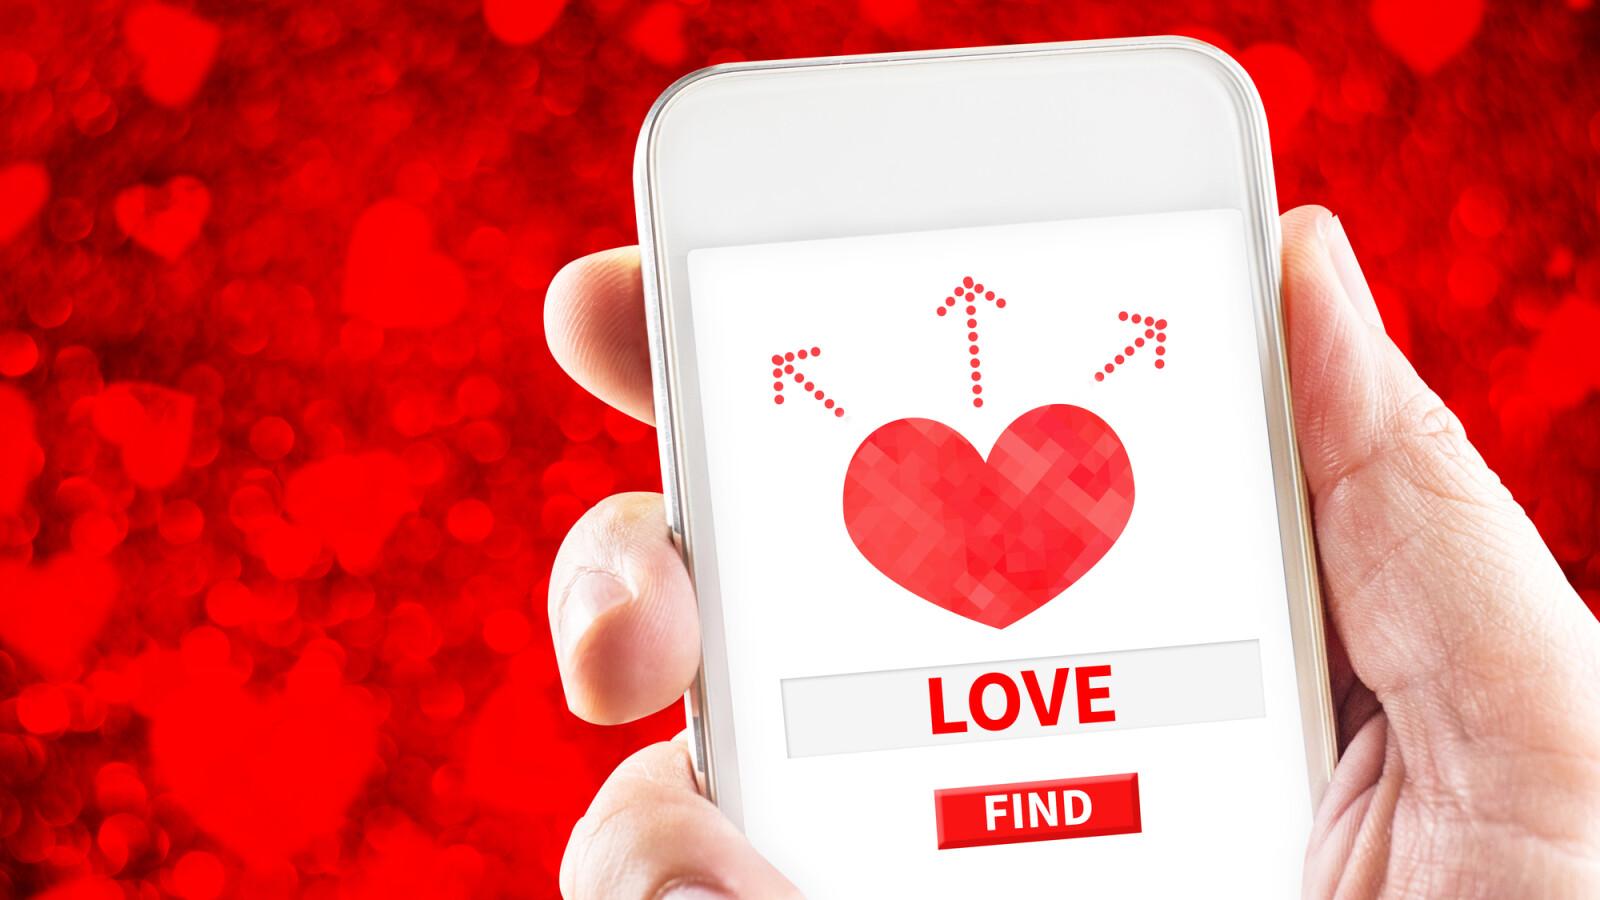 tinder dating app reagiert auf kritik der stiftung. Black Bedroom Furniture Sets. Home Design Ideas